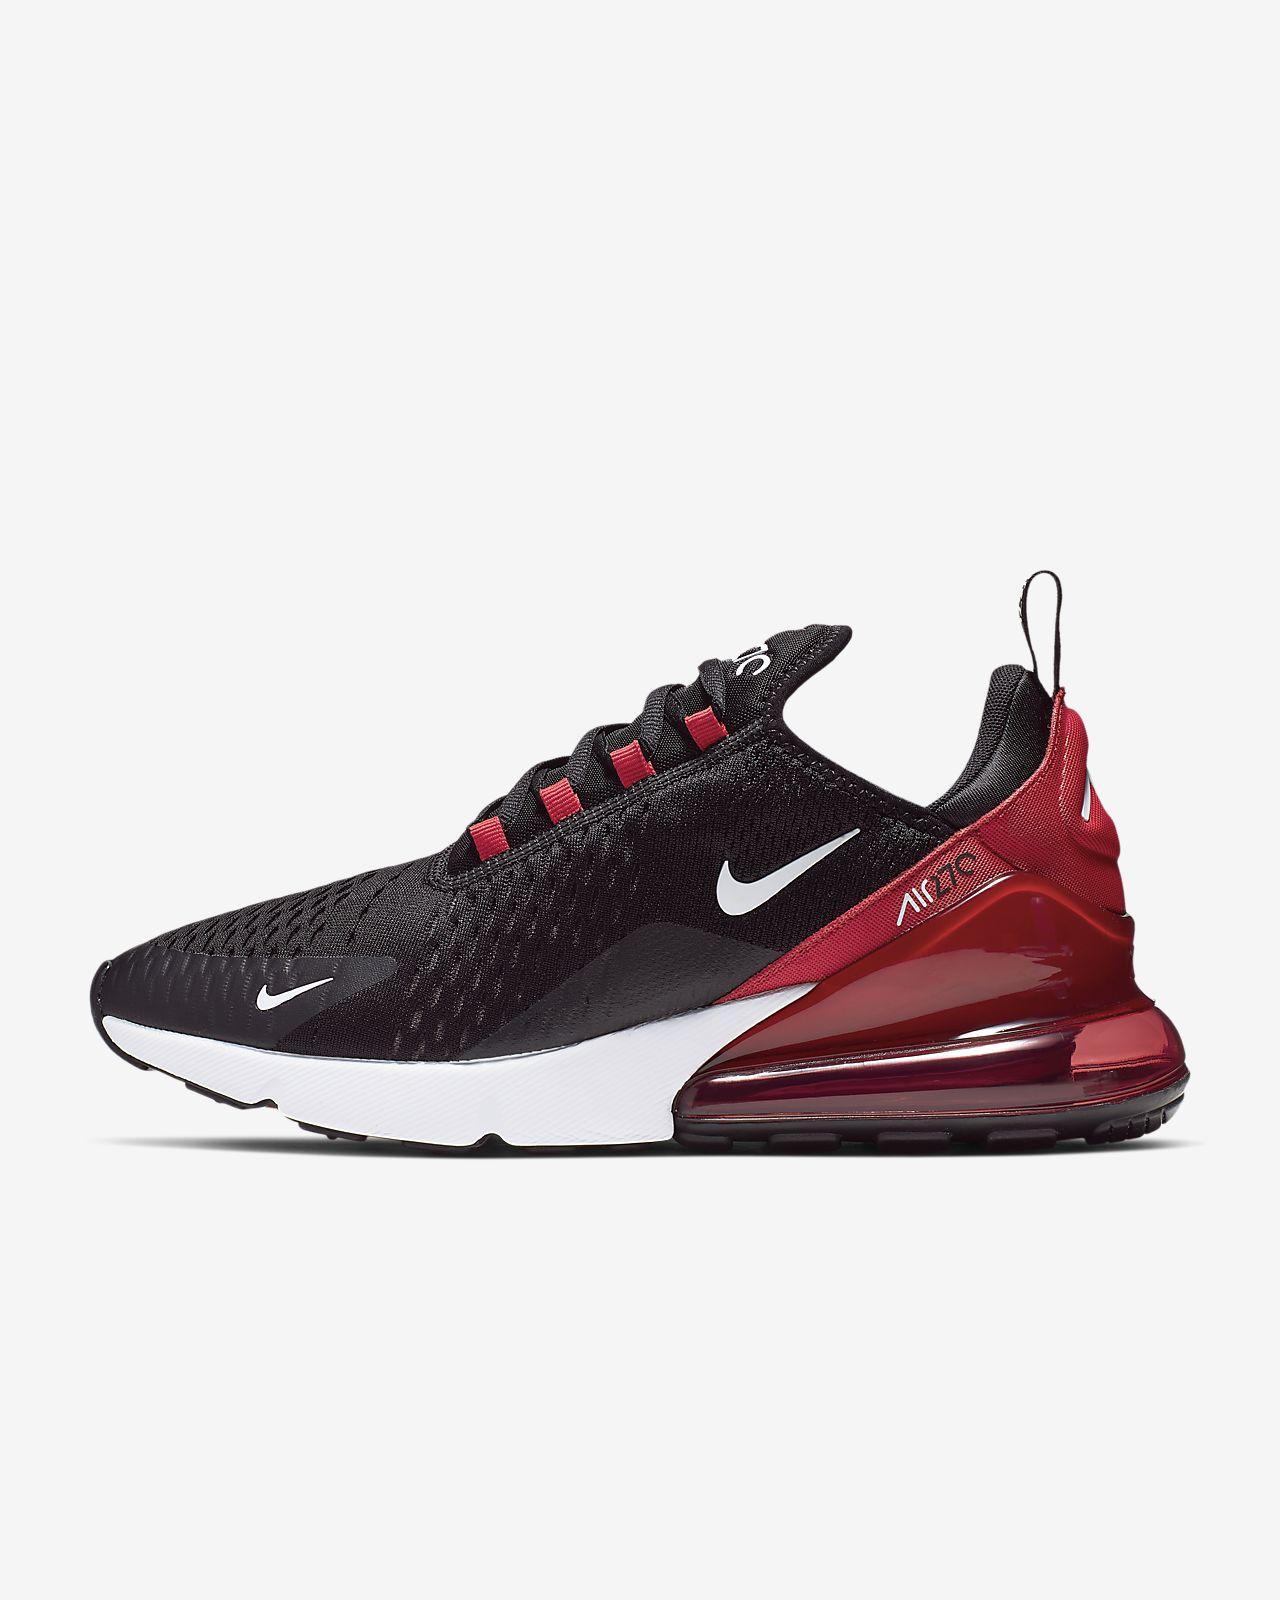 Calzado para hombre Nike Air Max 270